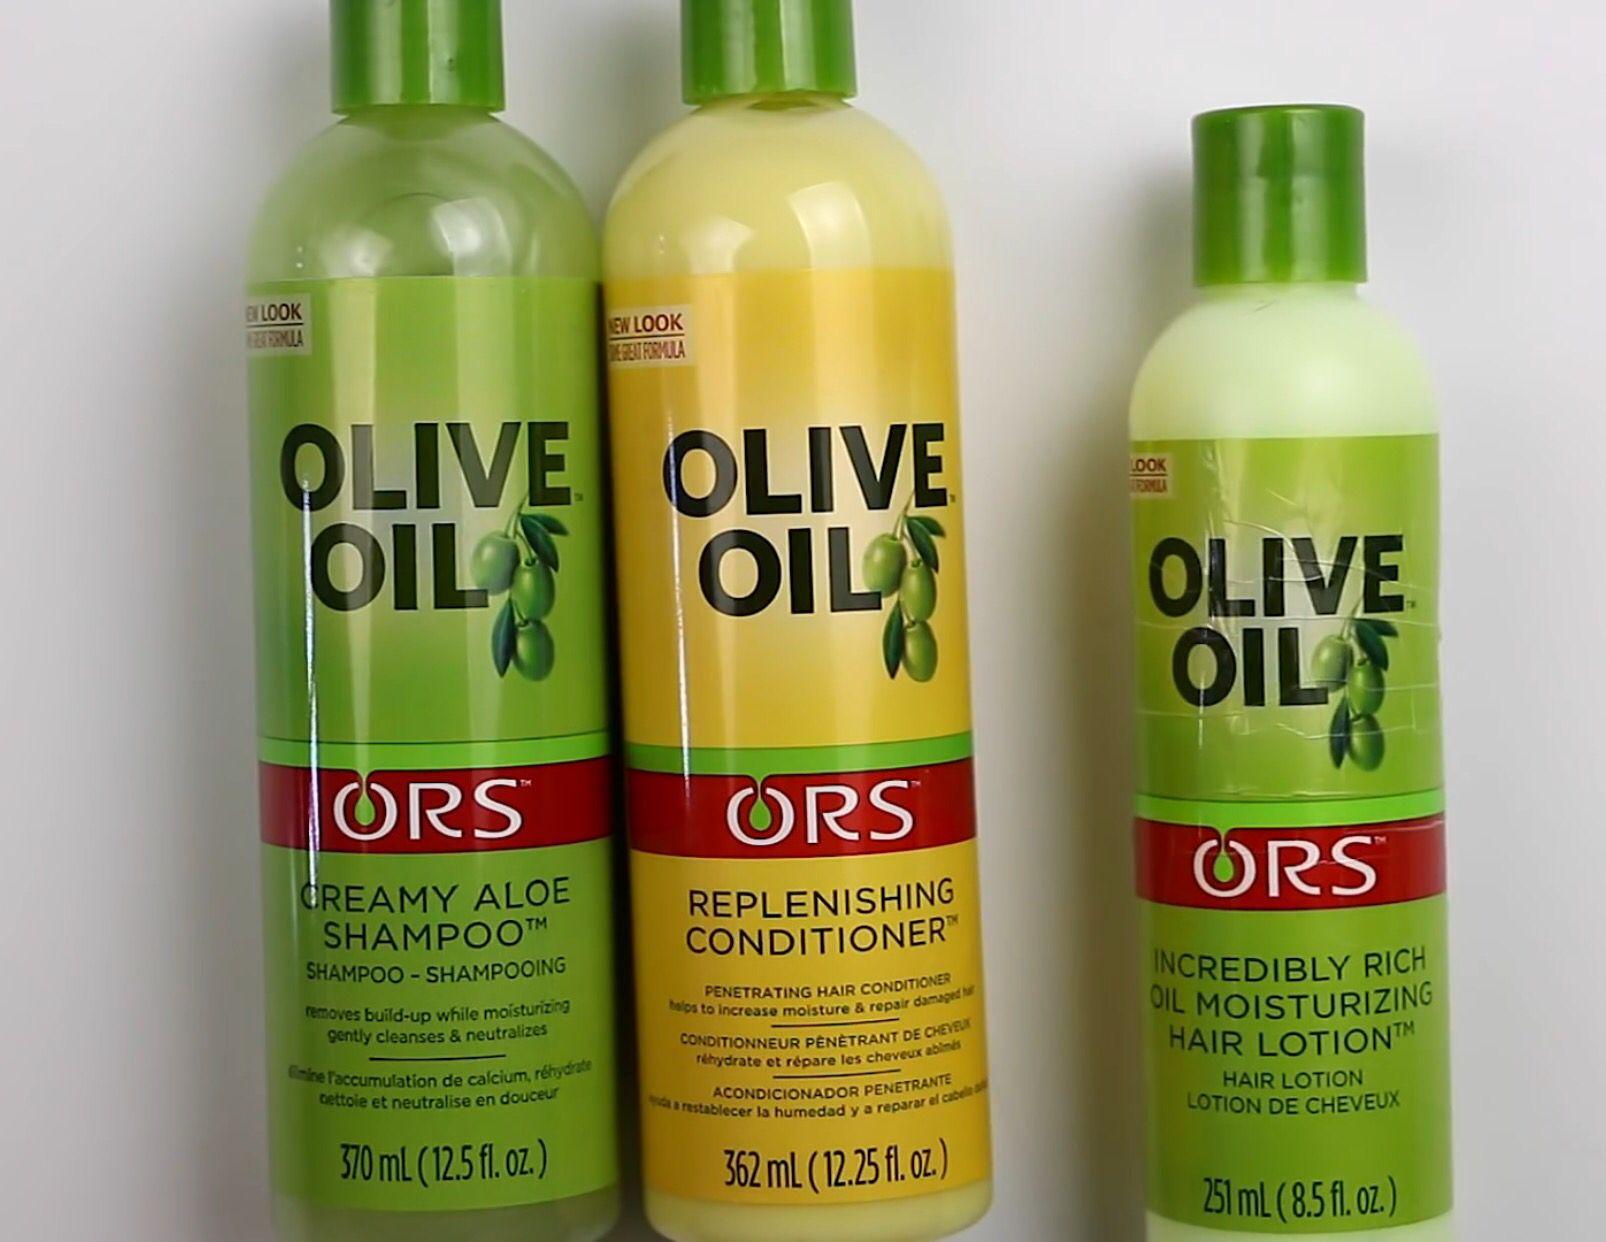 Ors Olive Oil Creamy Aloe Shampoo Peplenishing Conditioner And